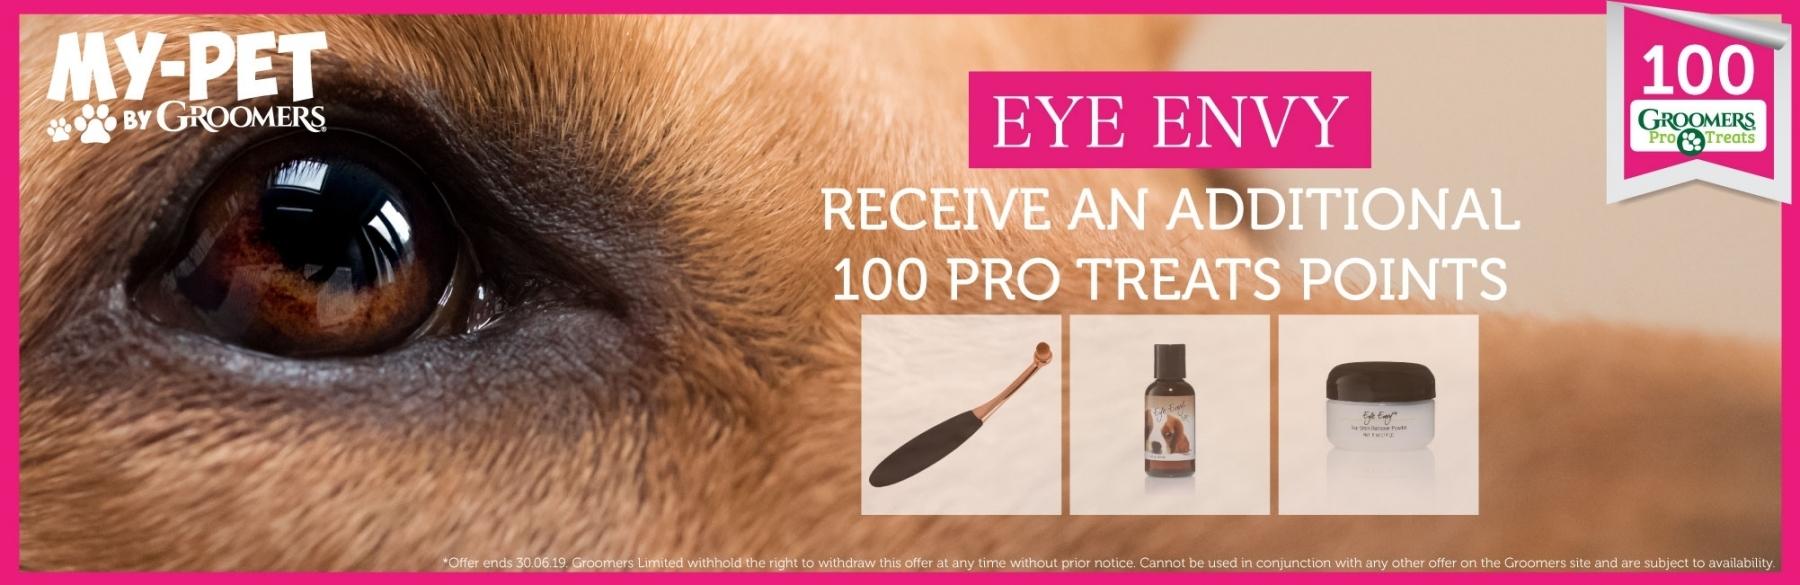 200 Bonus Pro Treat Points With Any Eye Envy Purchase